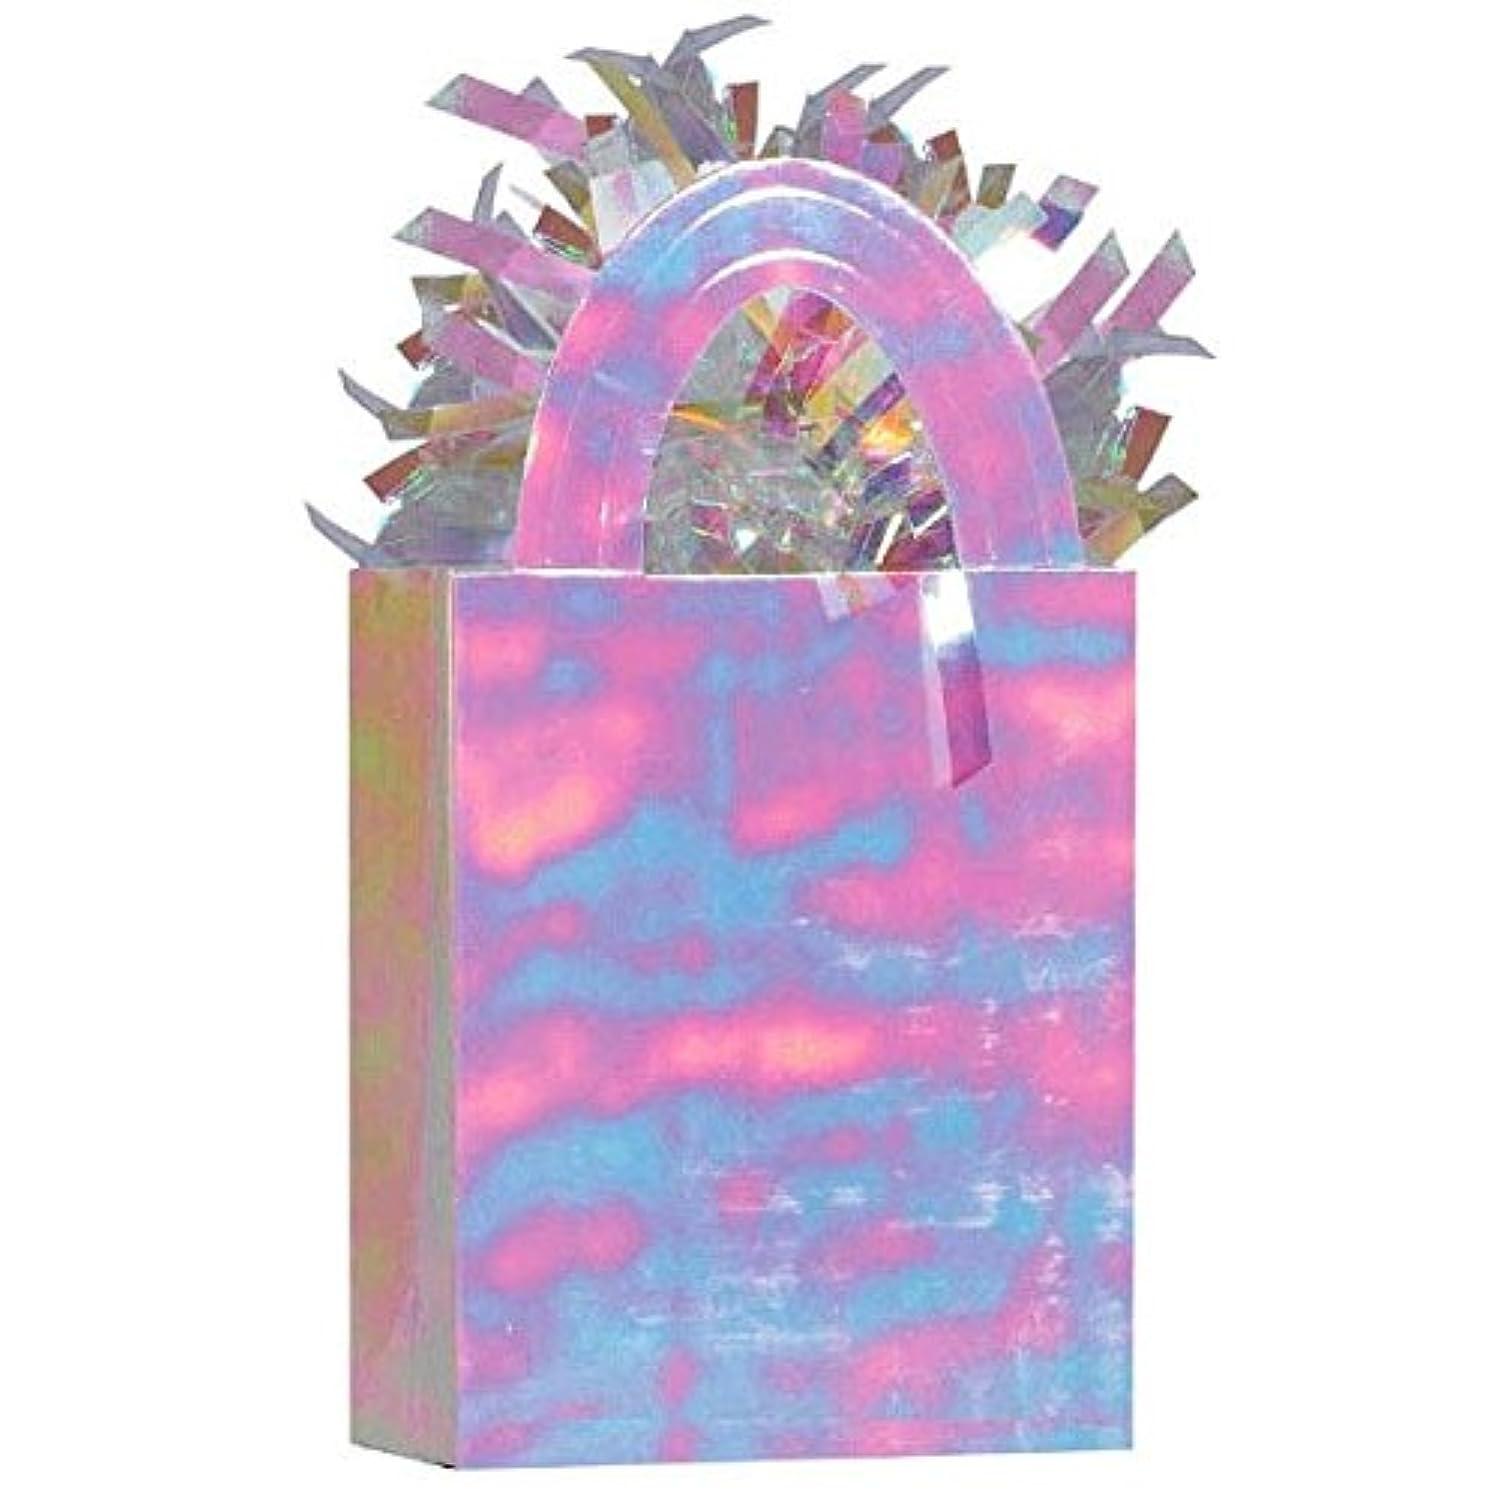 Amscan Iridescent Mini Tote Bag Birthday Balloon Weight, 5.7 oz, Bright Opal